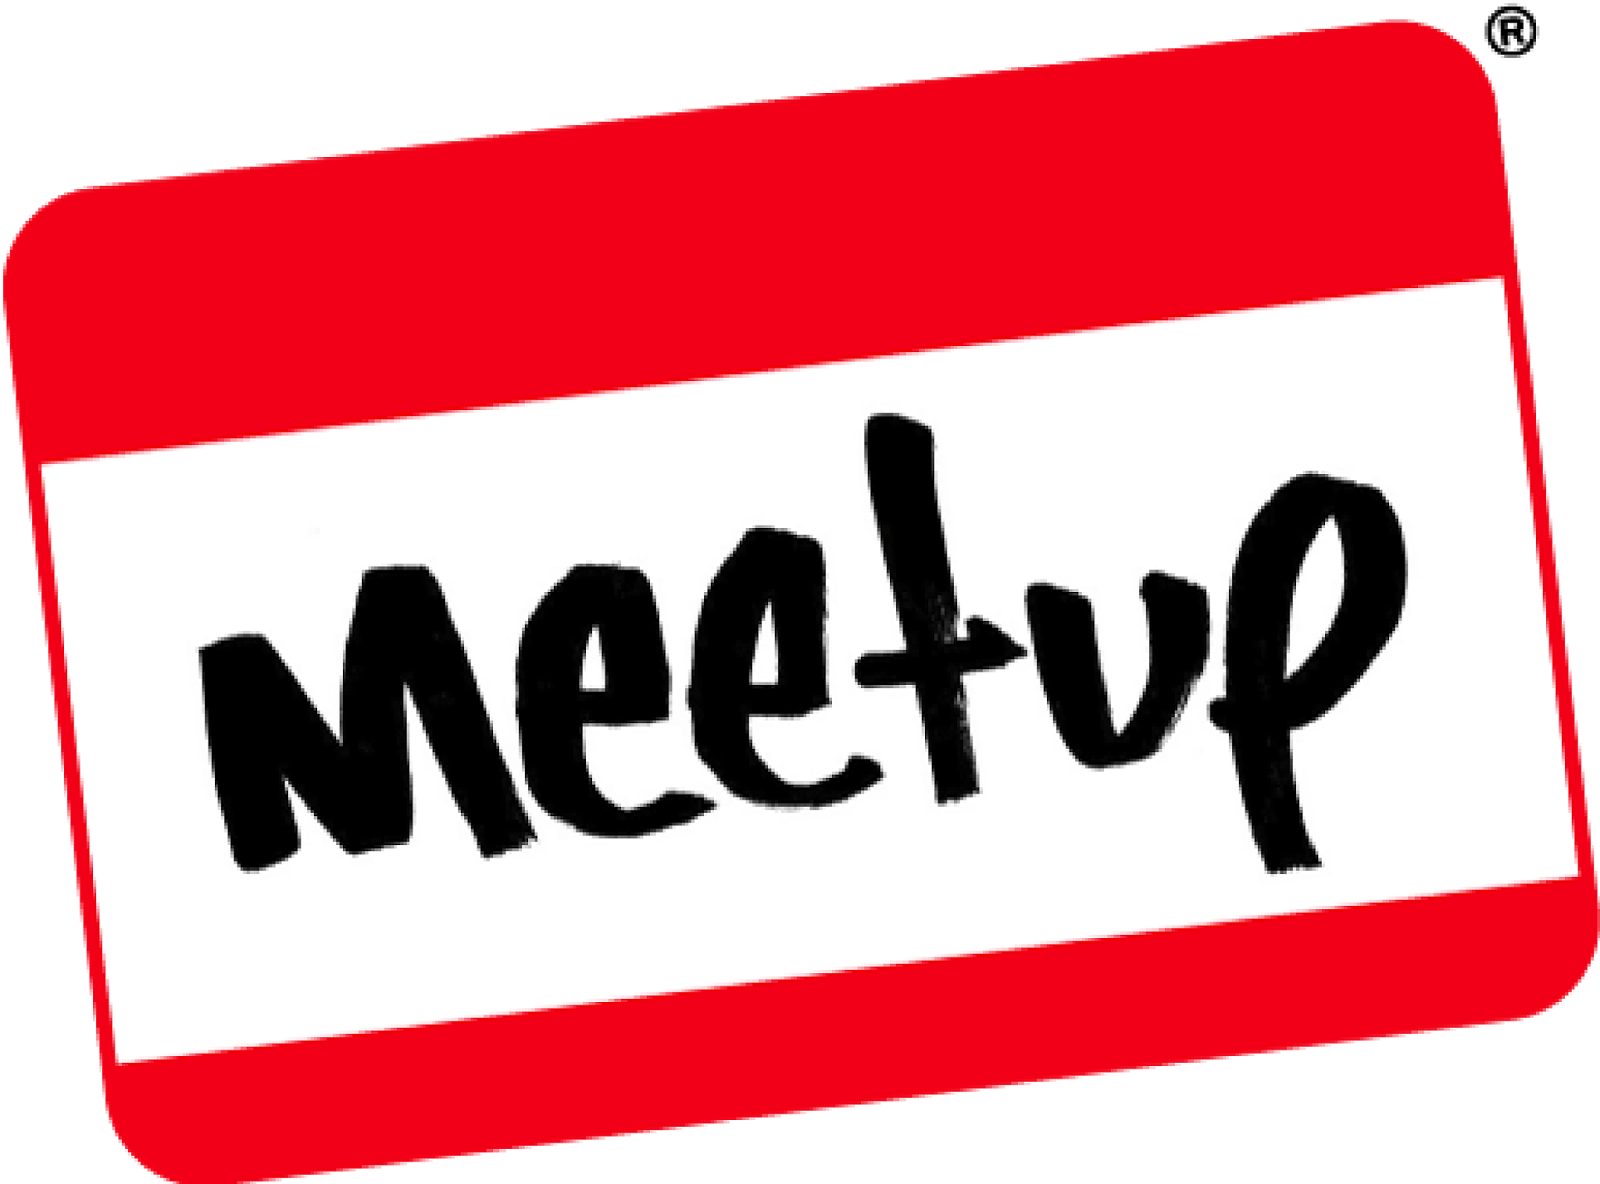 to meet us